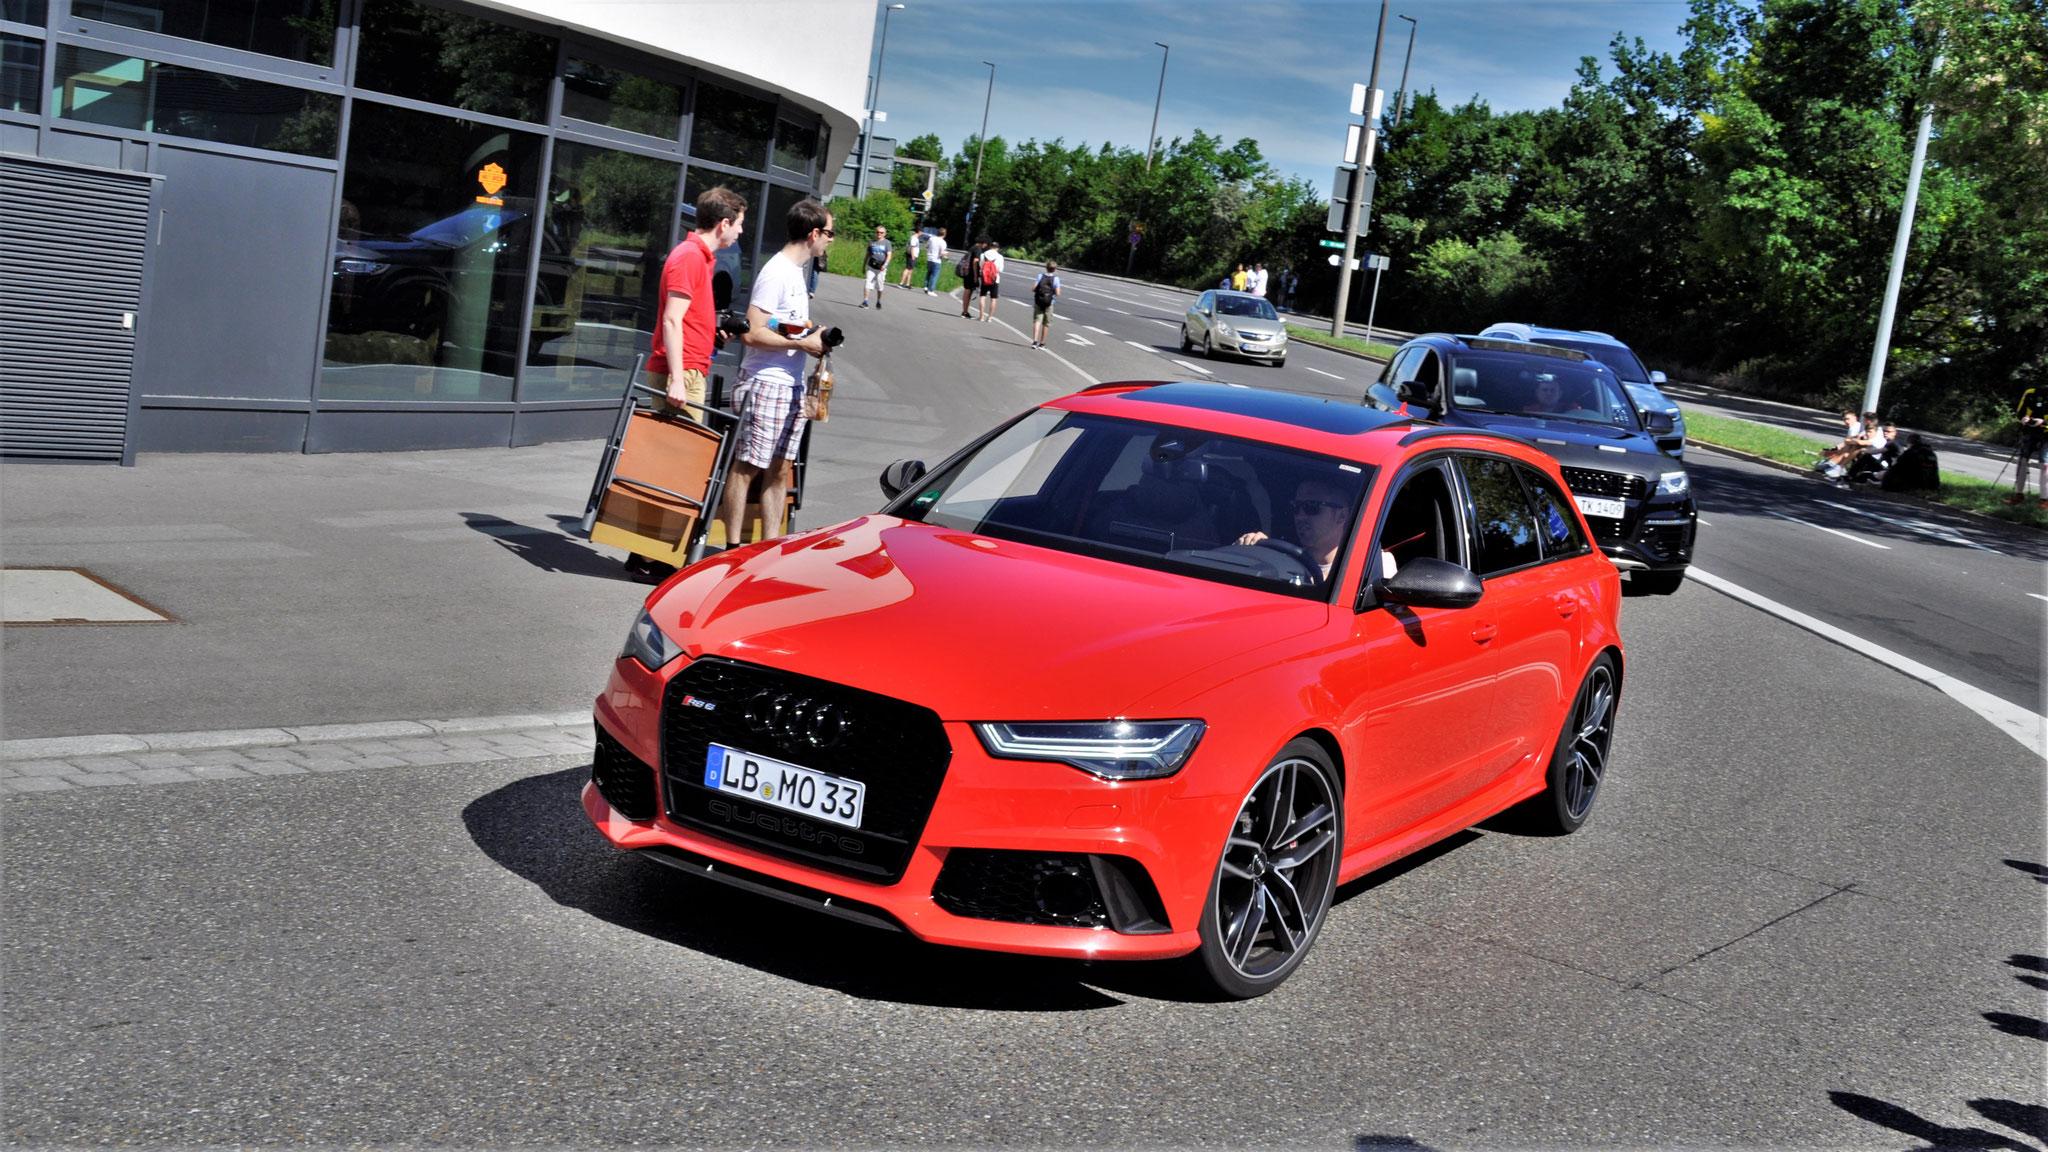 Audi RS6 - LB-MO-33